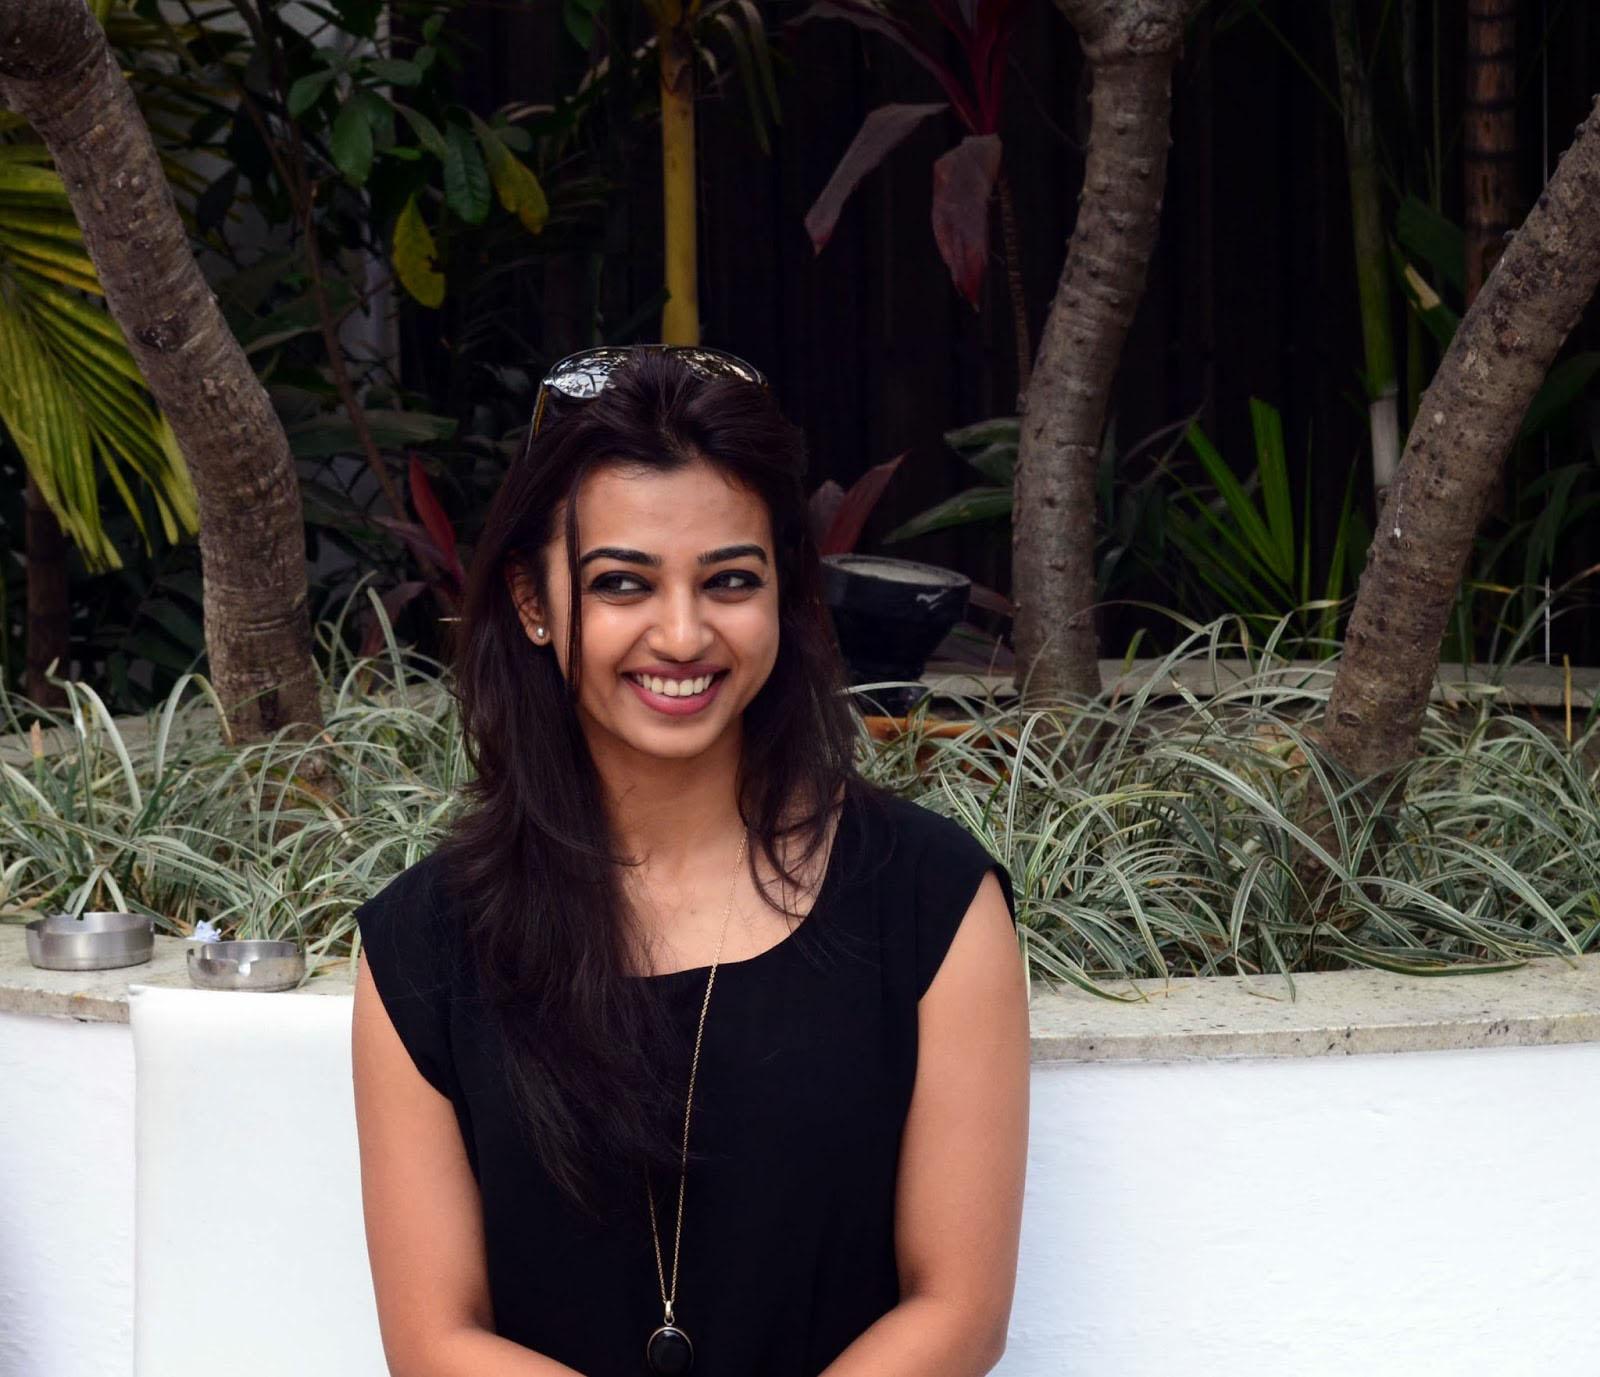 radhika apte full images